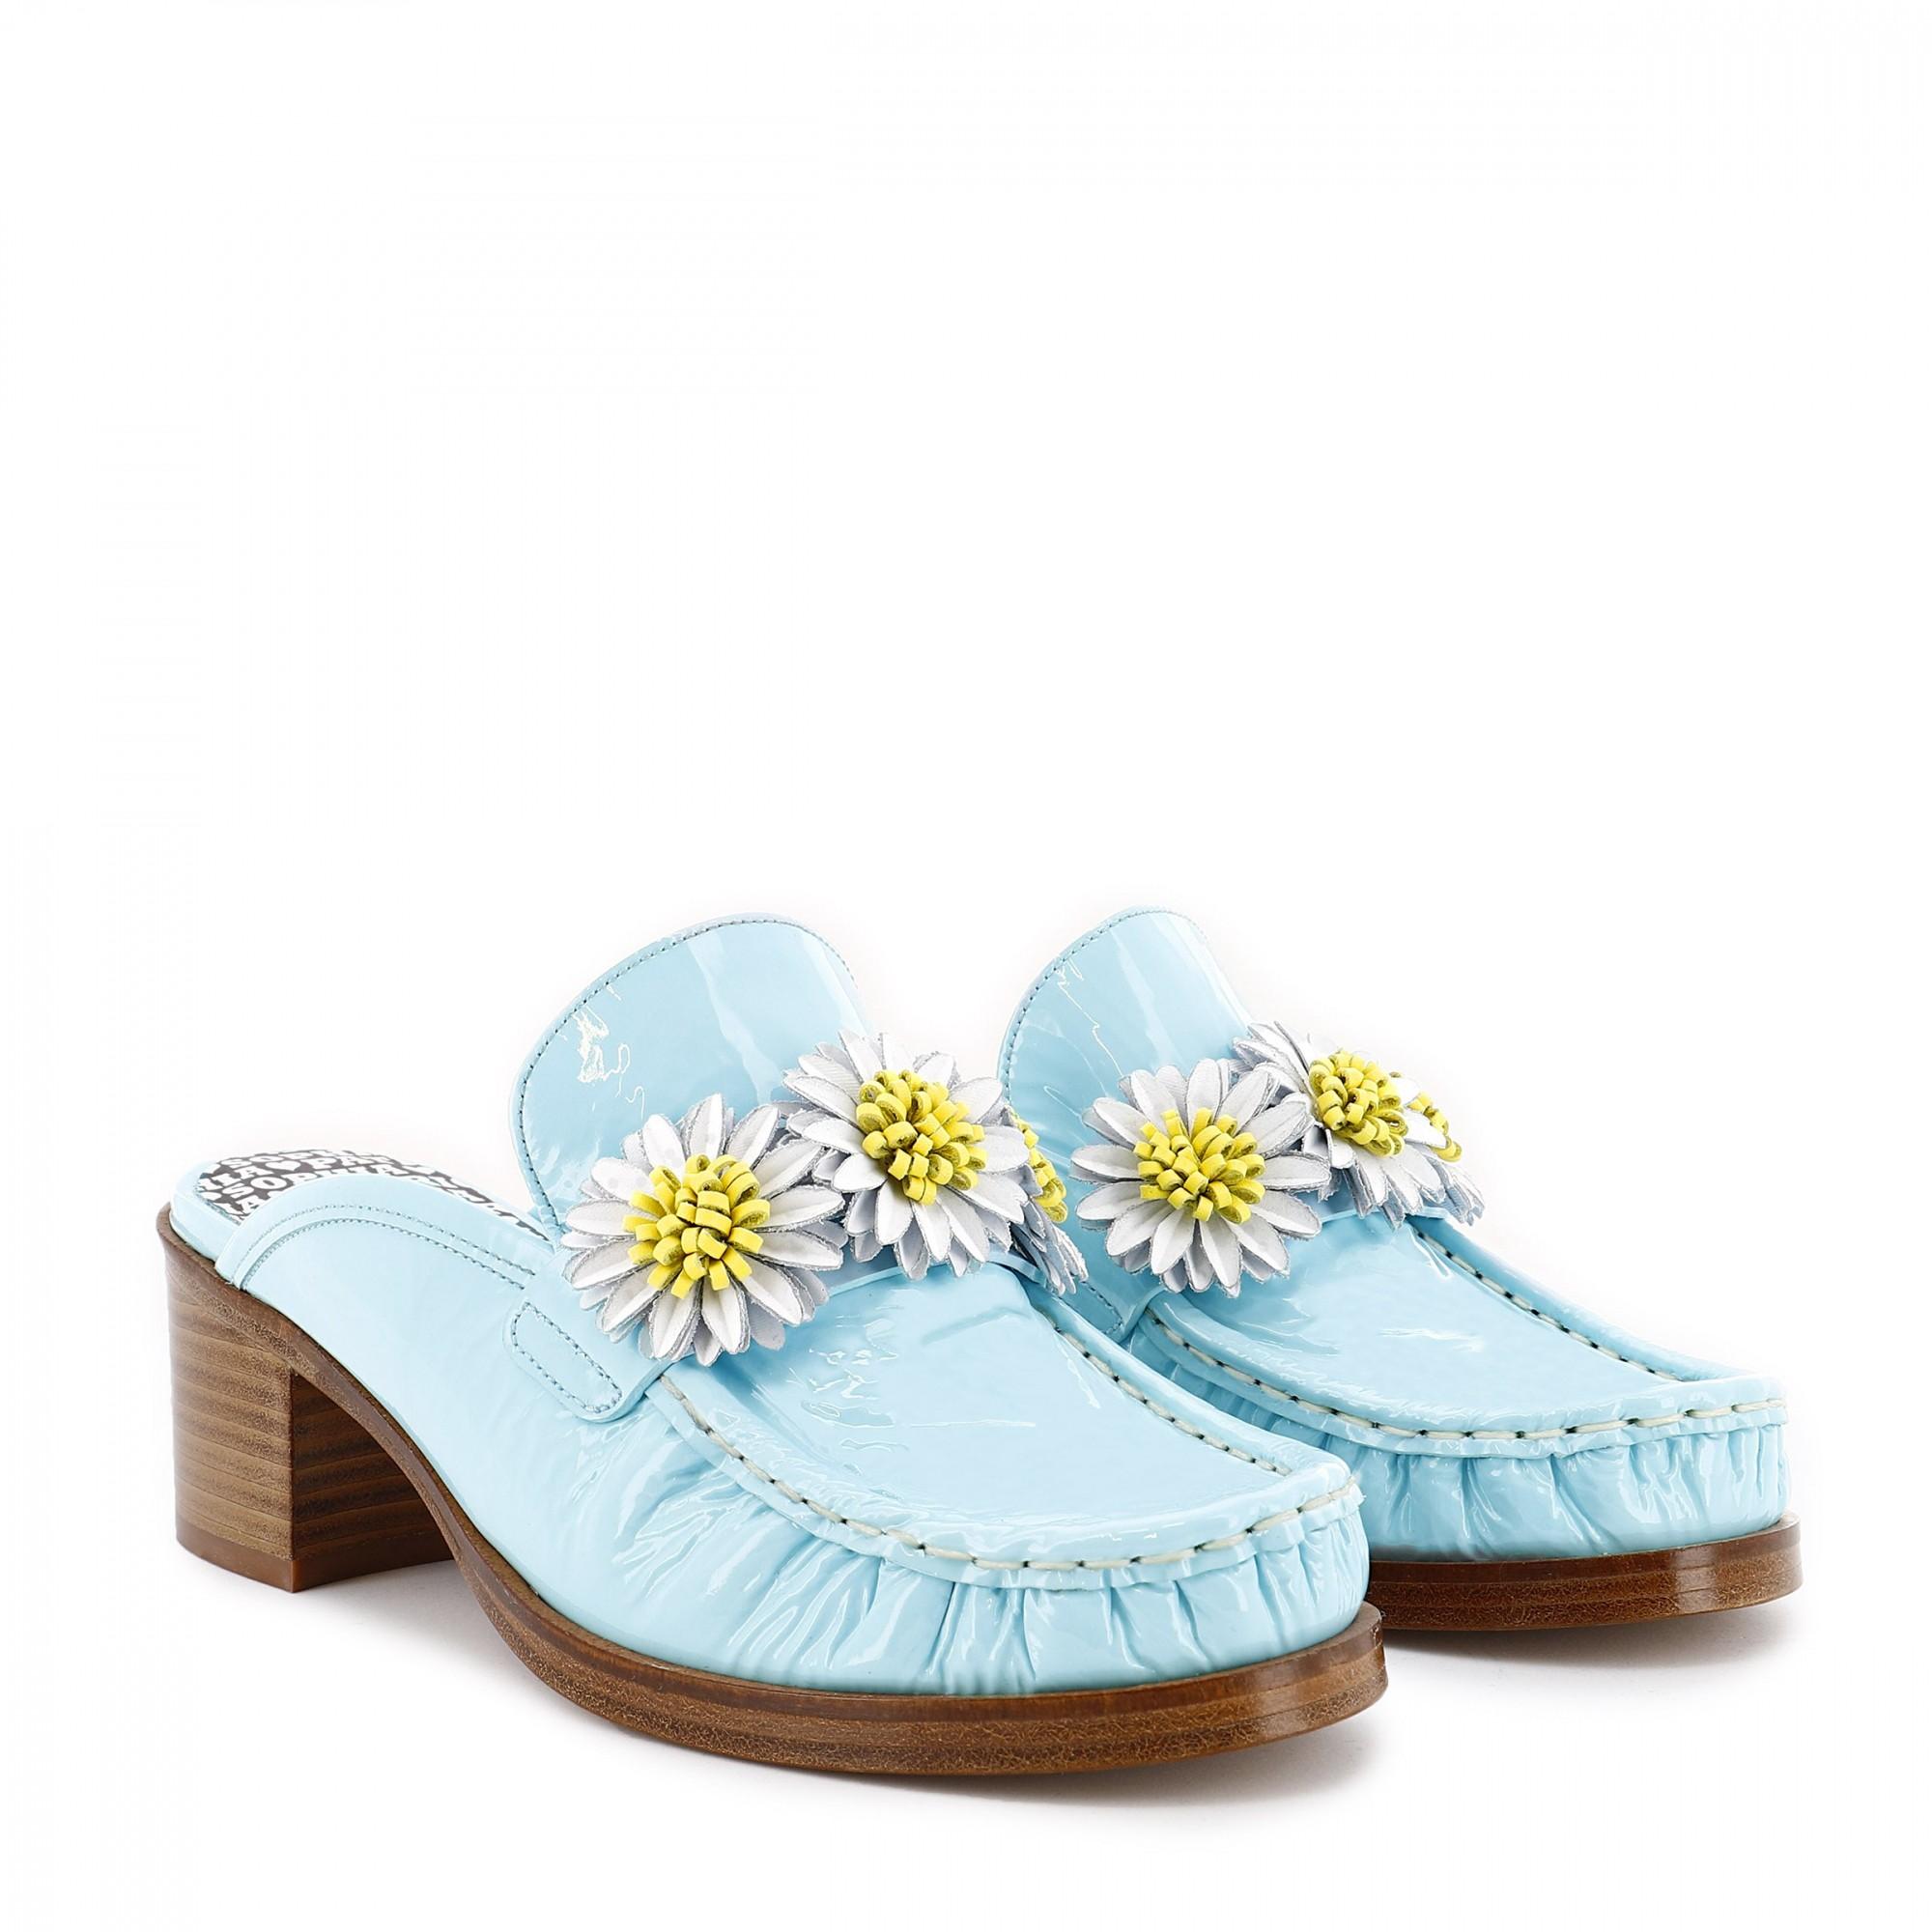 Daisy Trend: Η γκαρνταρόμπα μας γεμίζει μαργαρίτες